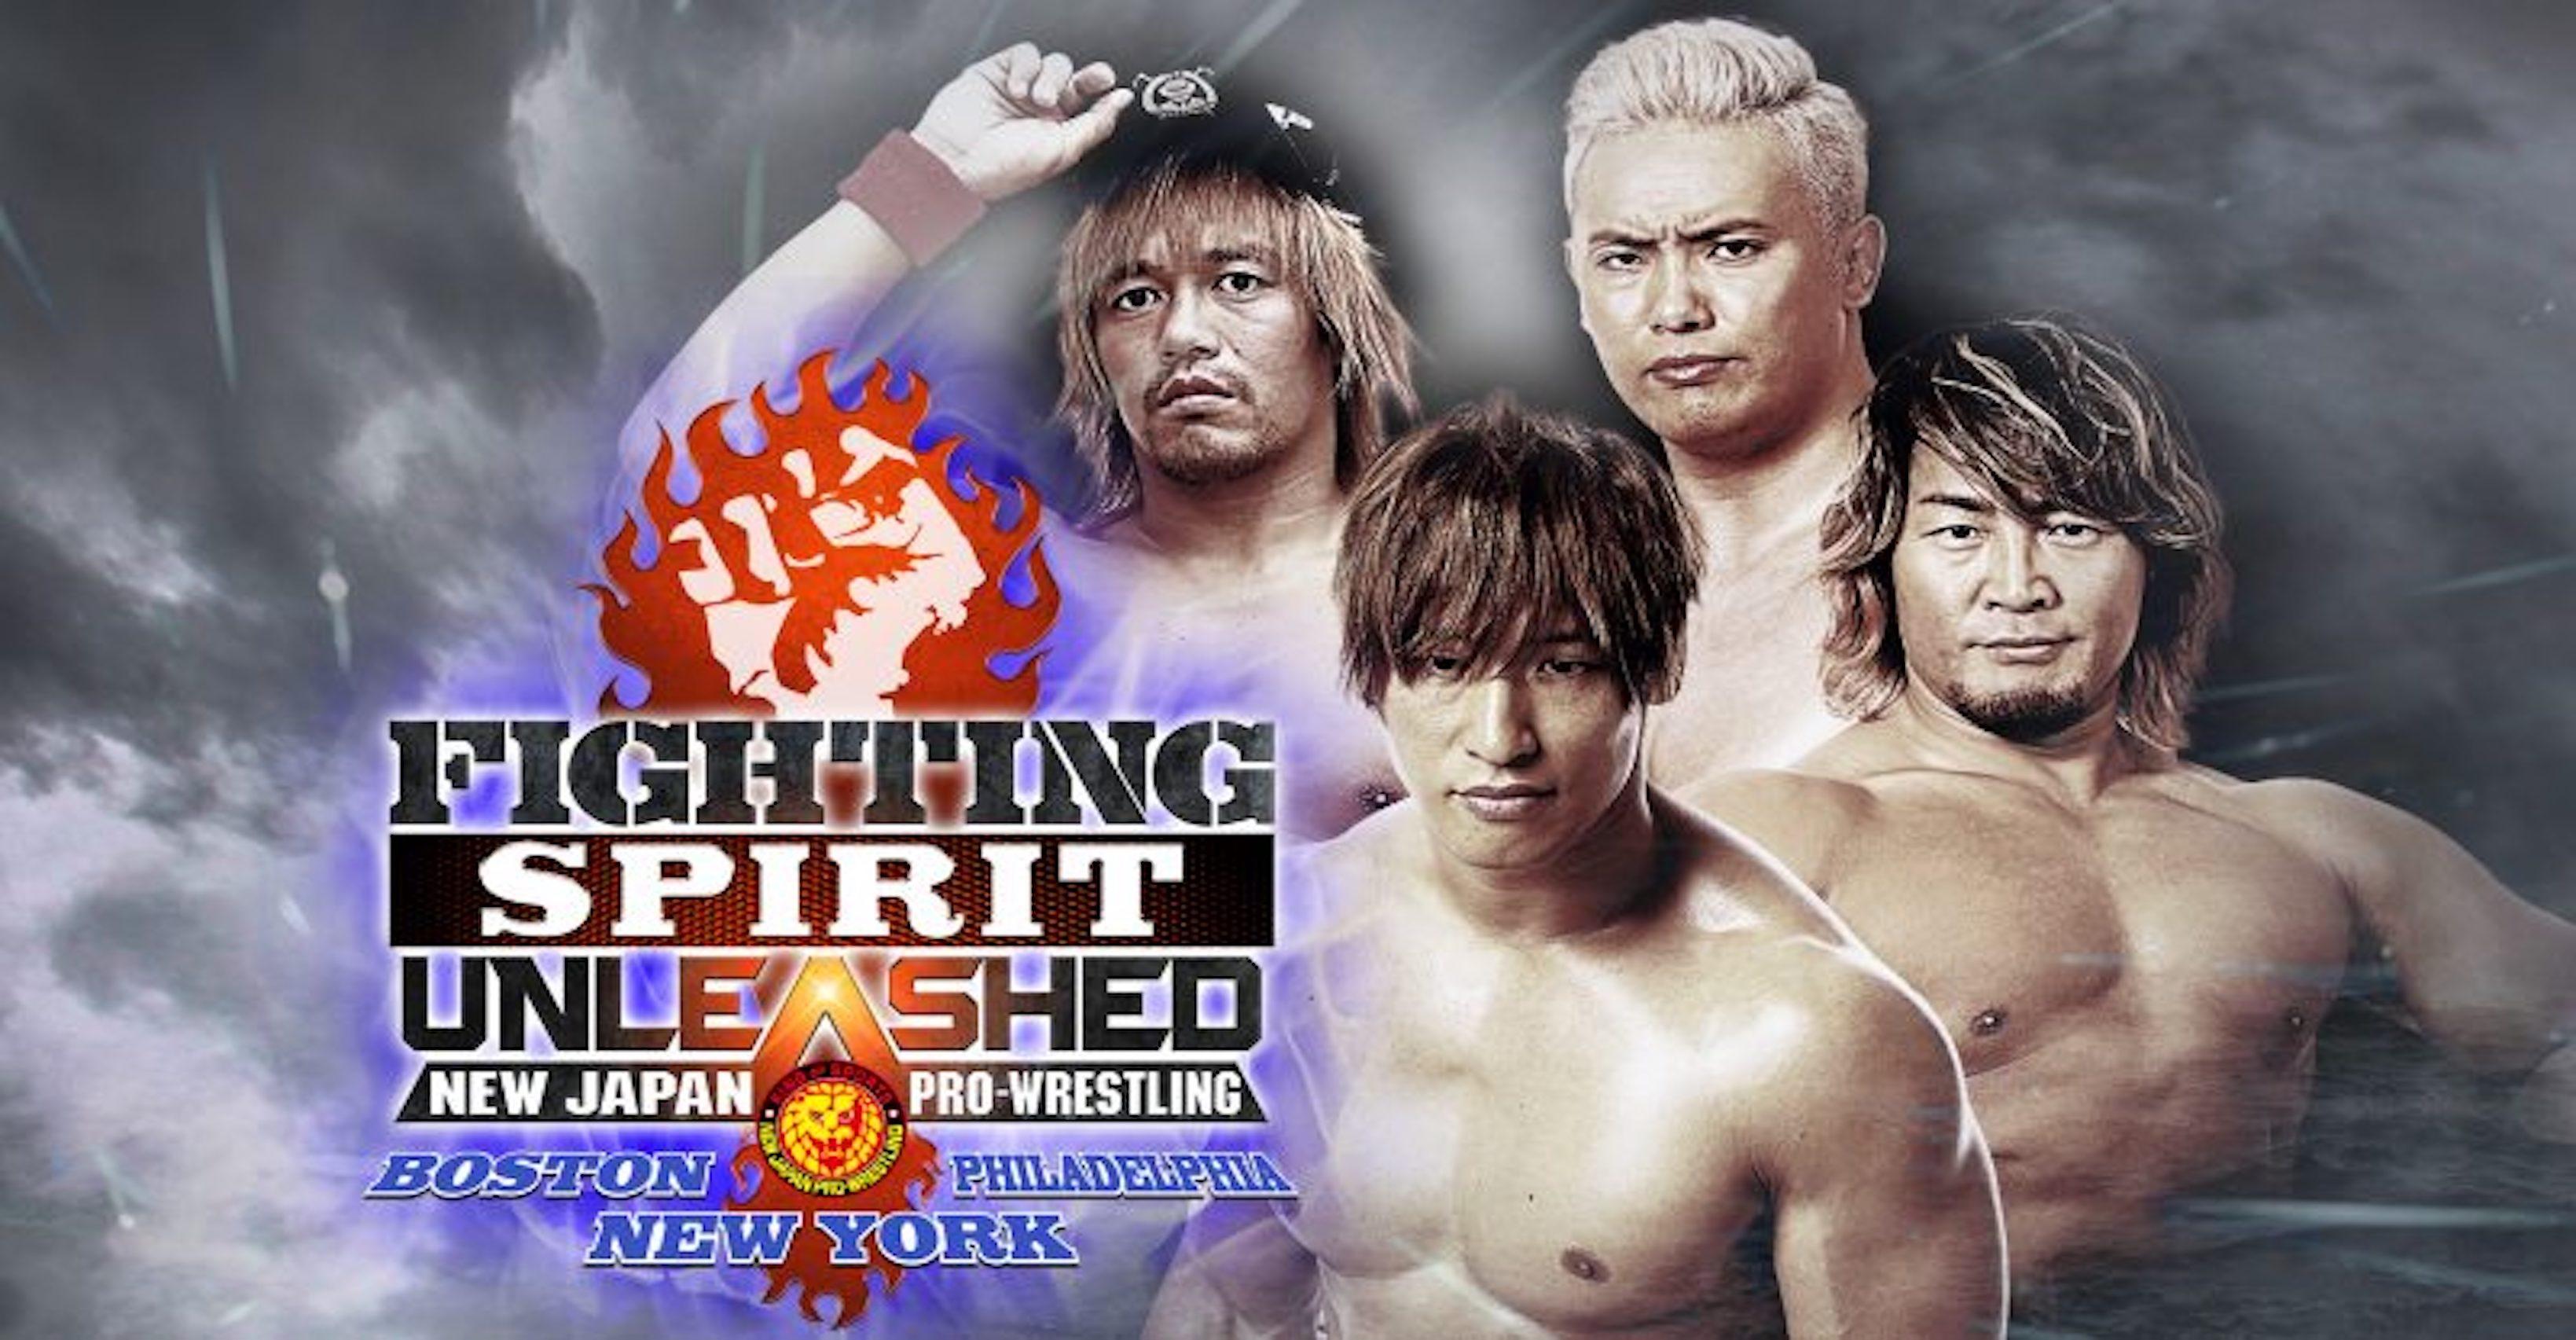 New Japan Pro Wrestling Event In New York Possibly Sabotaged?